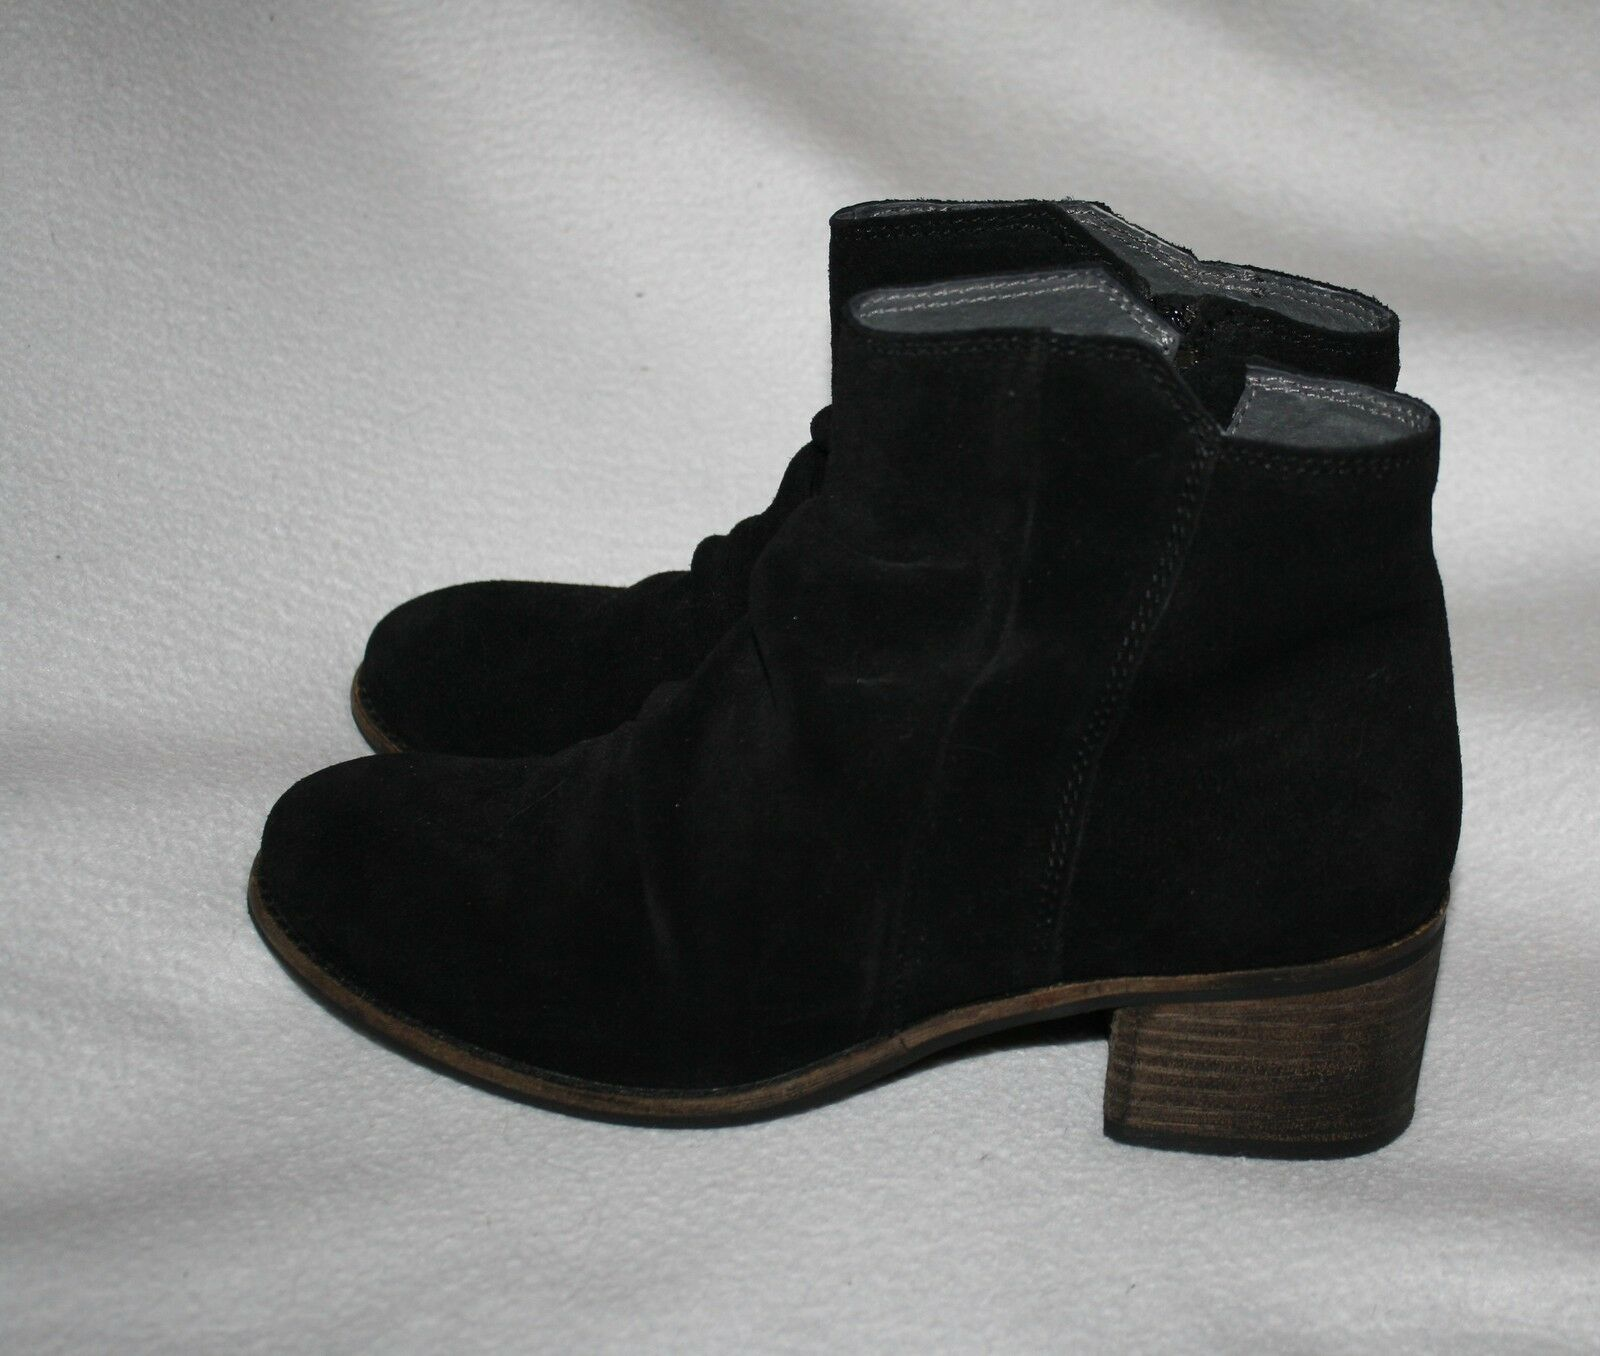 Women Seychelles Hawthorne Black Suede Leather Ankle Zip  Boot Shoe Size 8.5 M